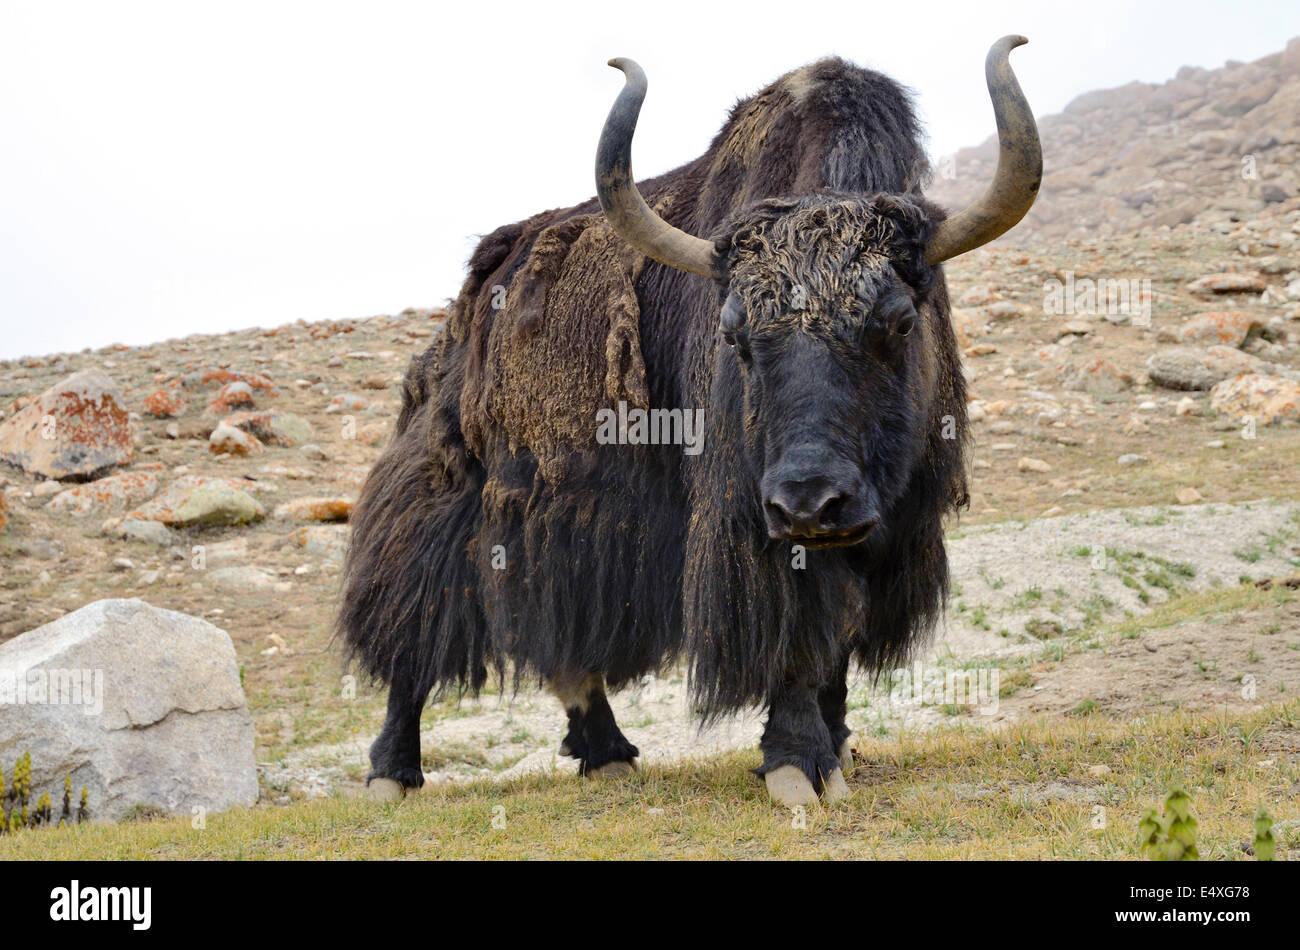 Image Of A Yak: Yak Nepal Stock Photos & Yak Nepal Stock Images